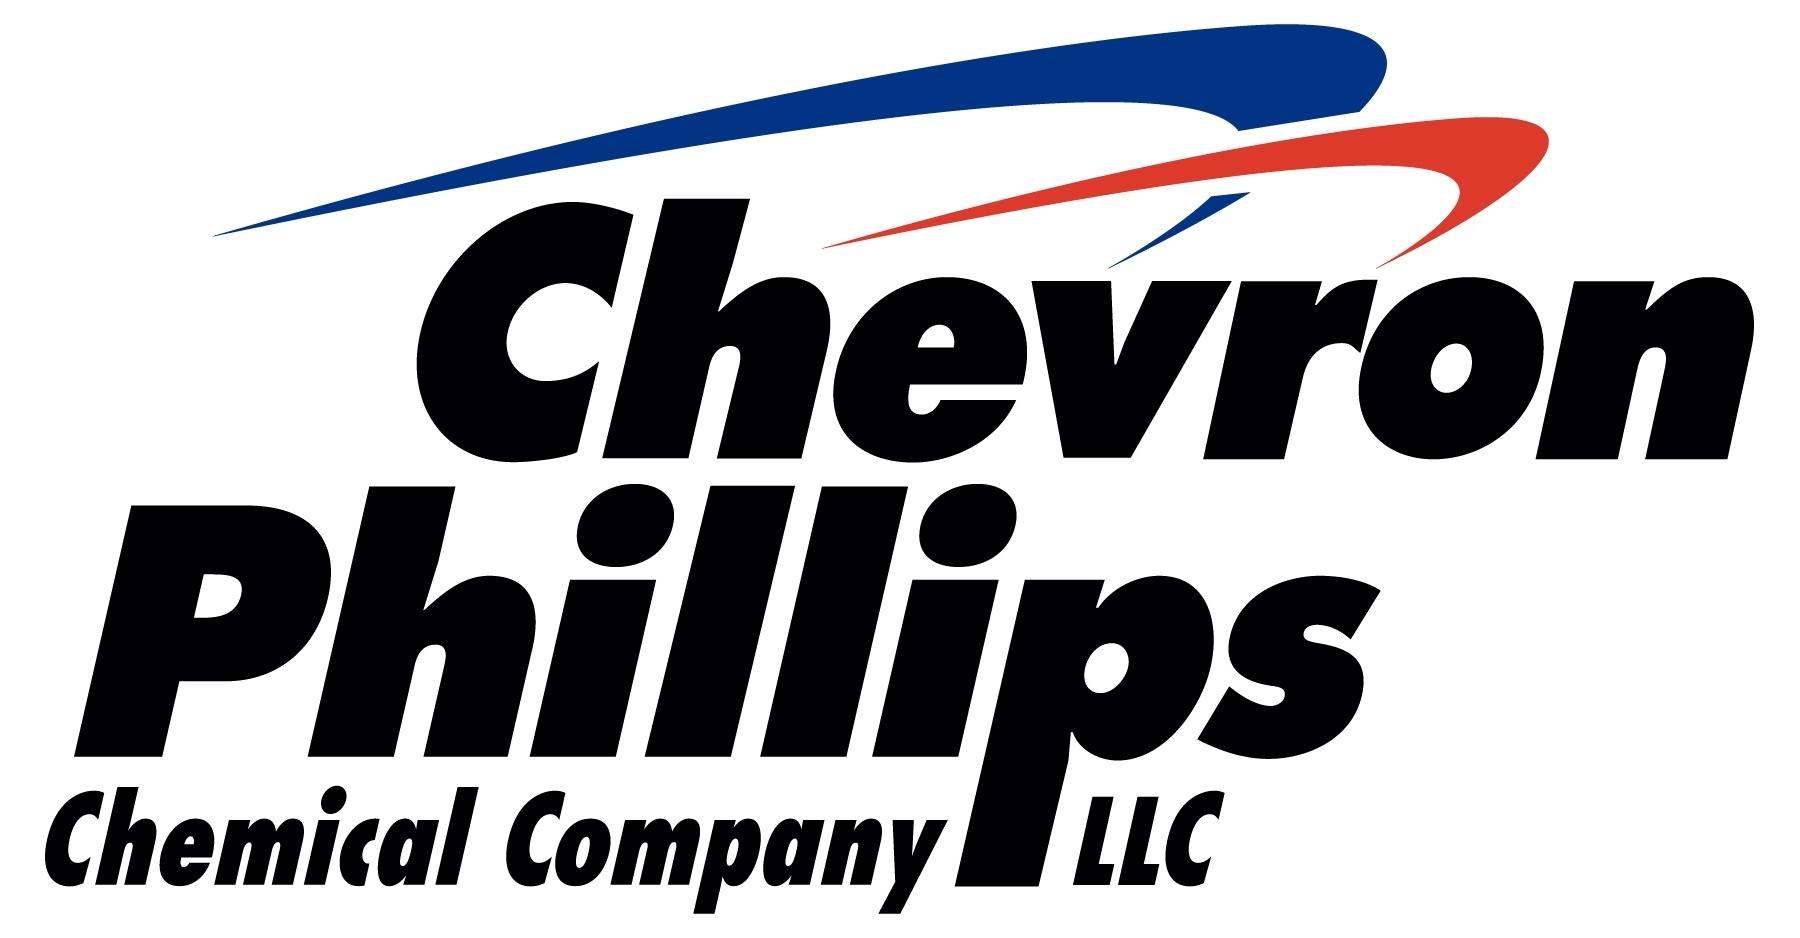 CPChem_logo.jpg